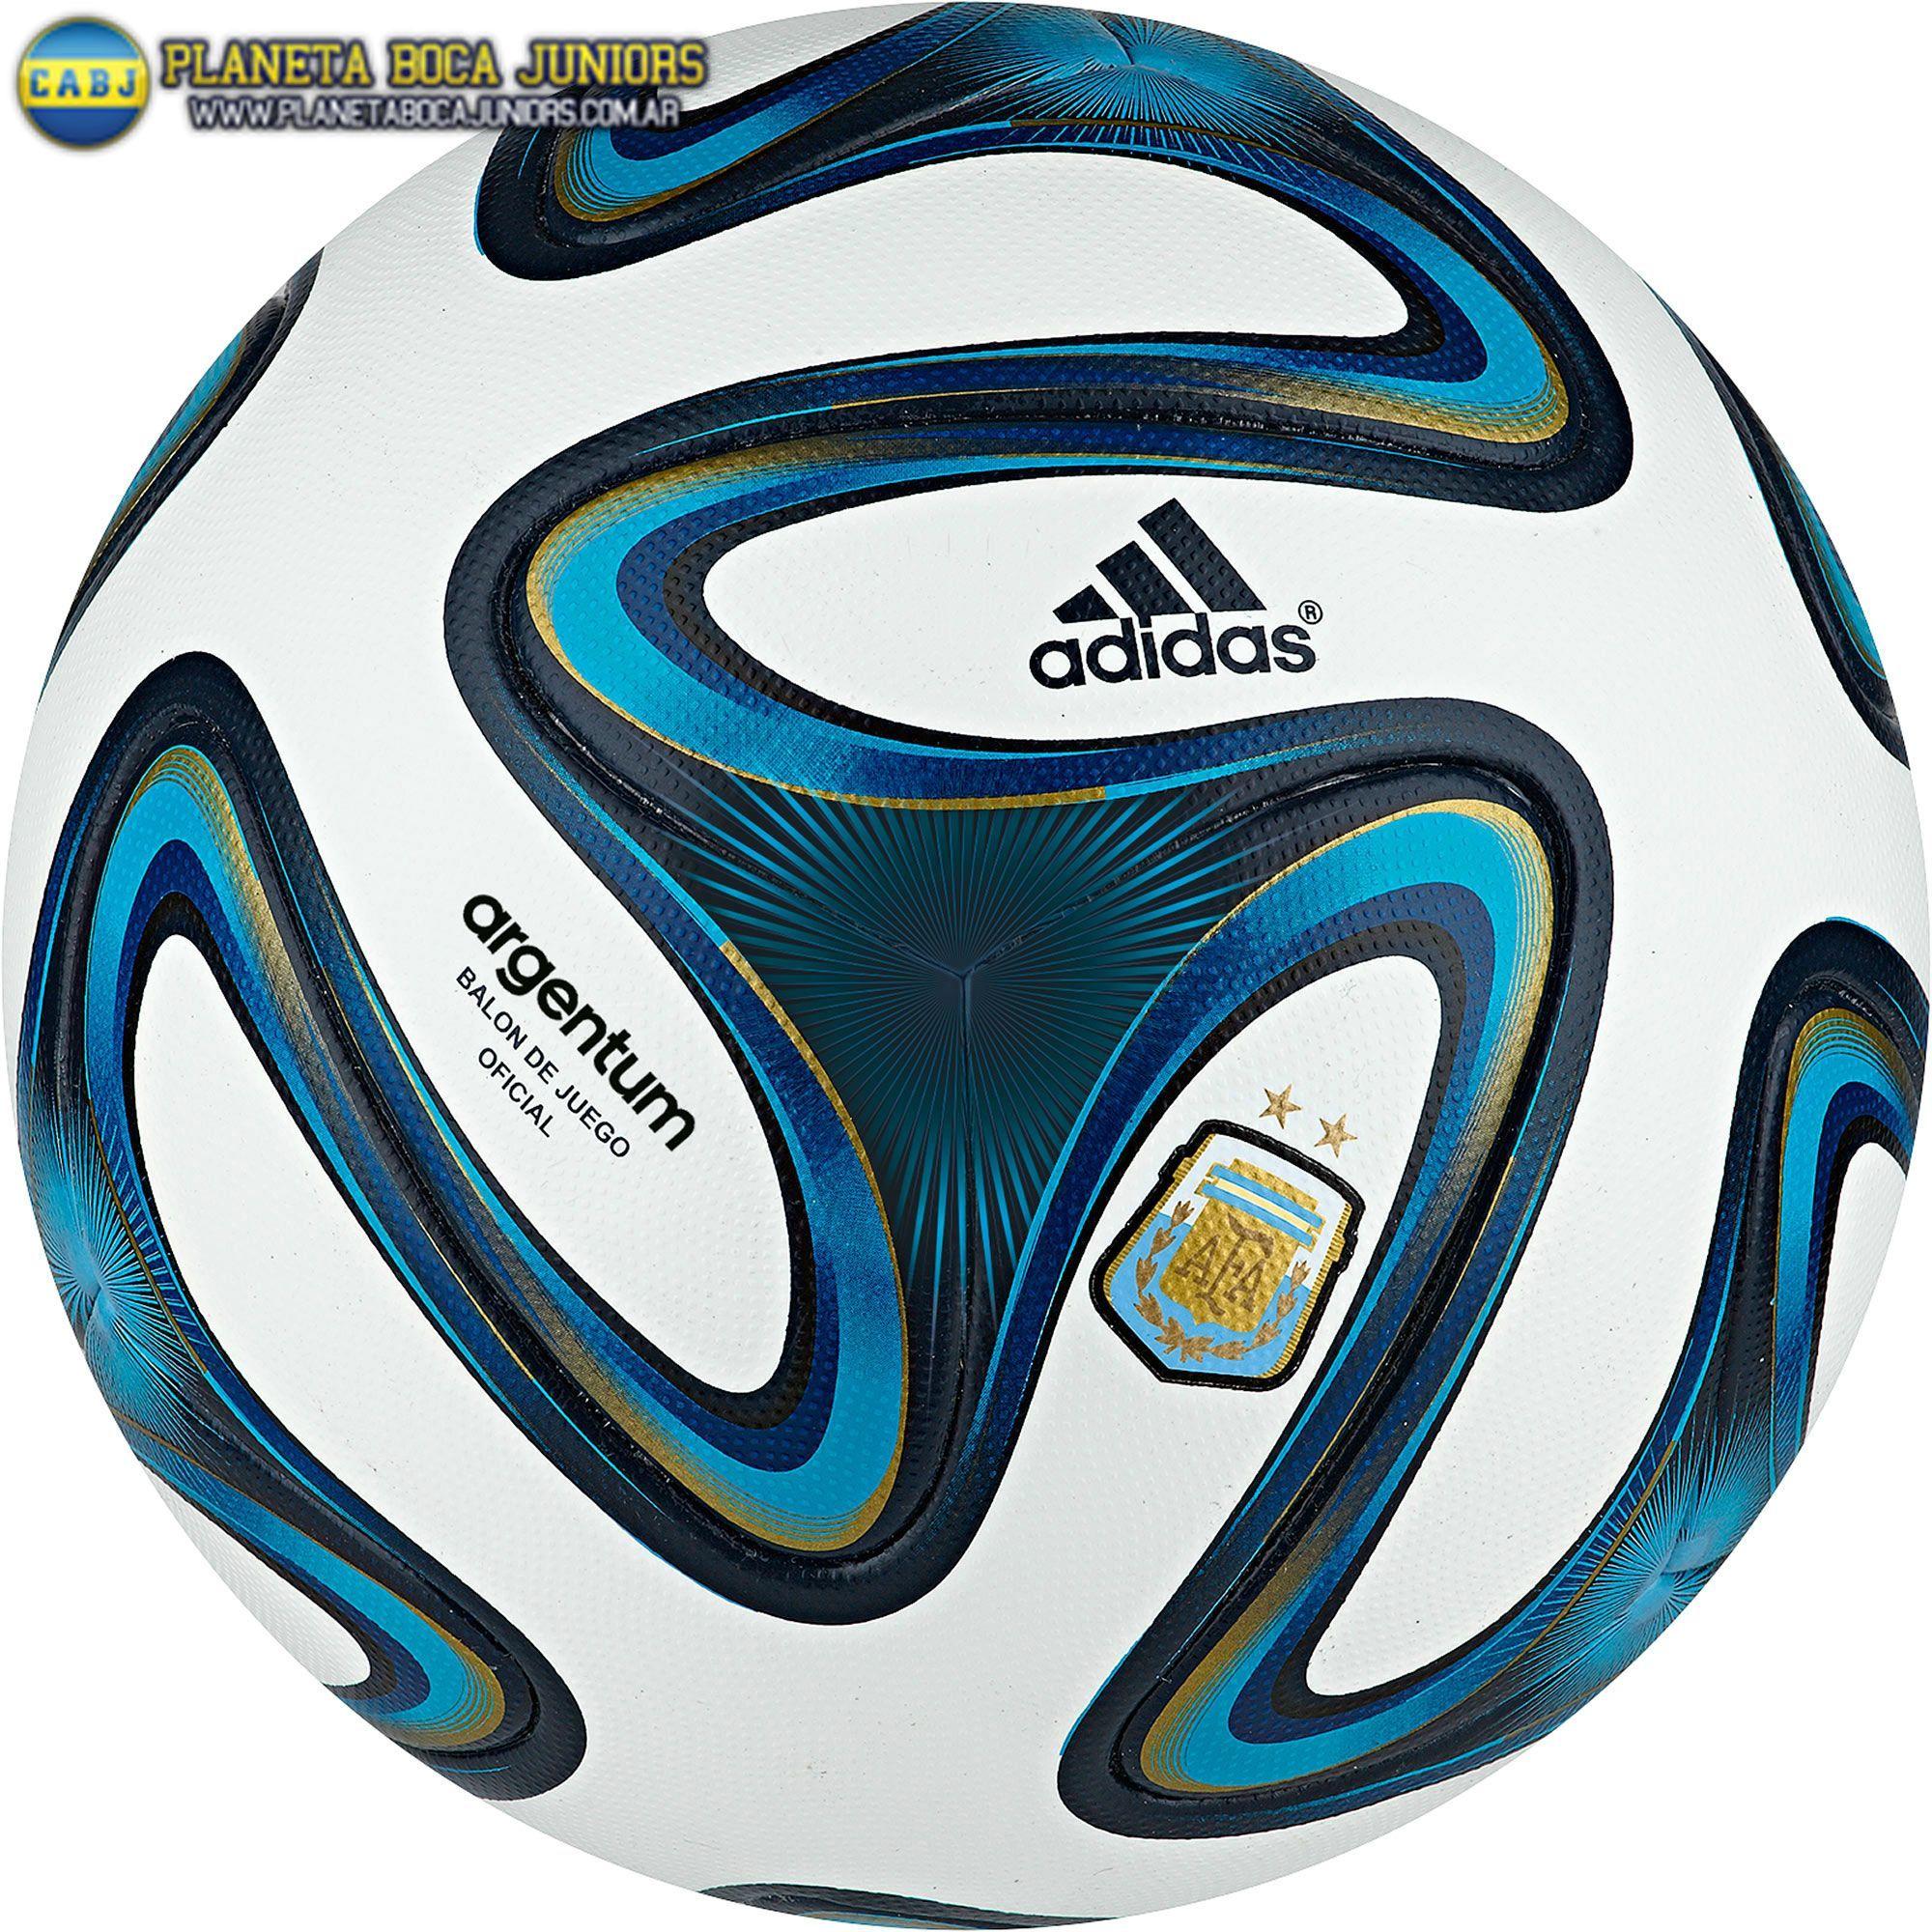 pelota de futbol - Buscar con Google  b1178156ca5fe